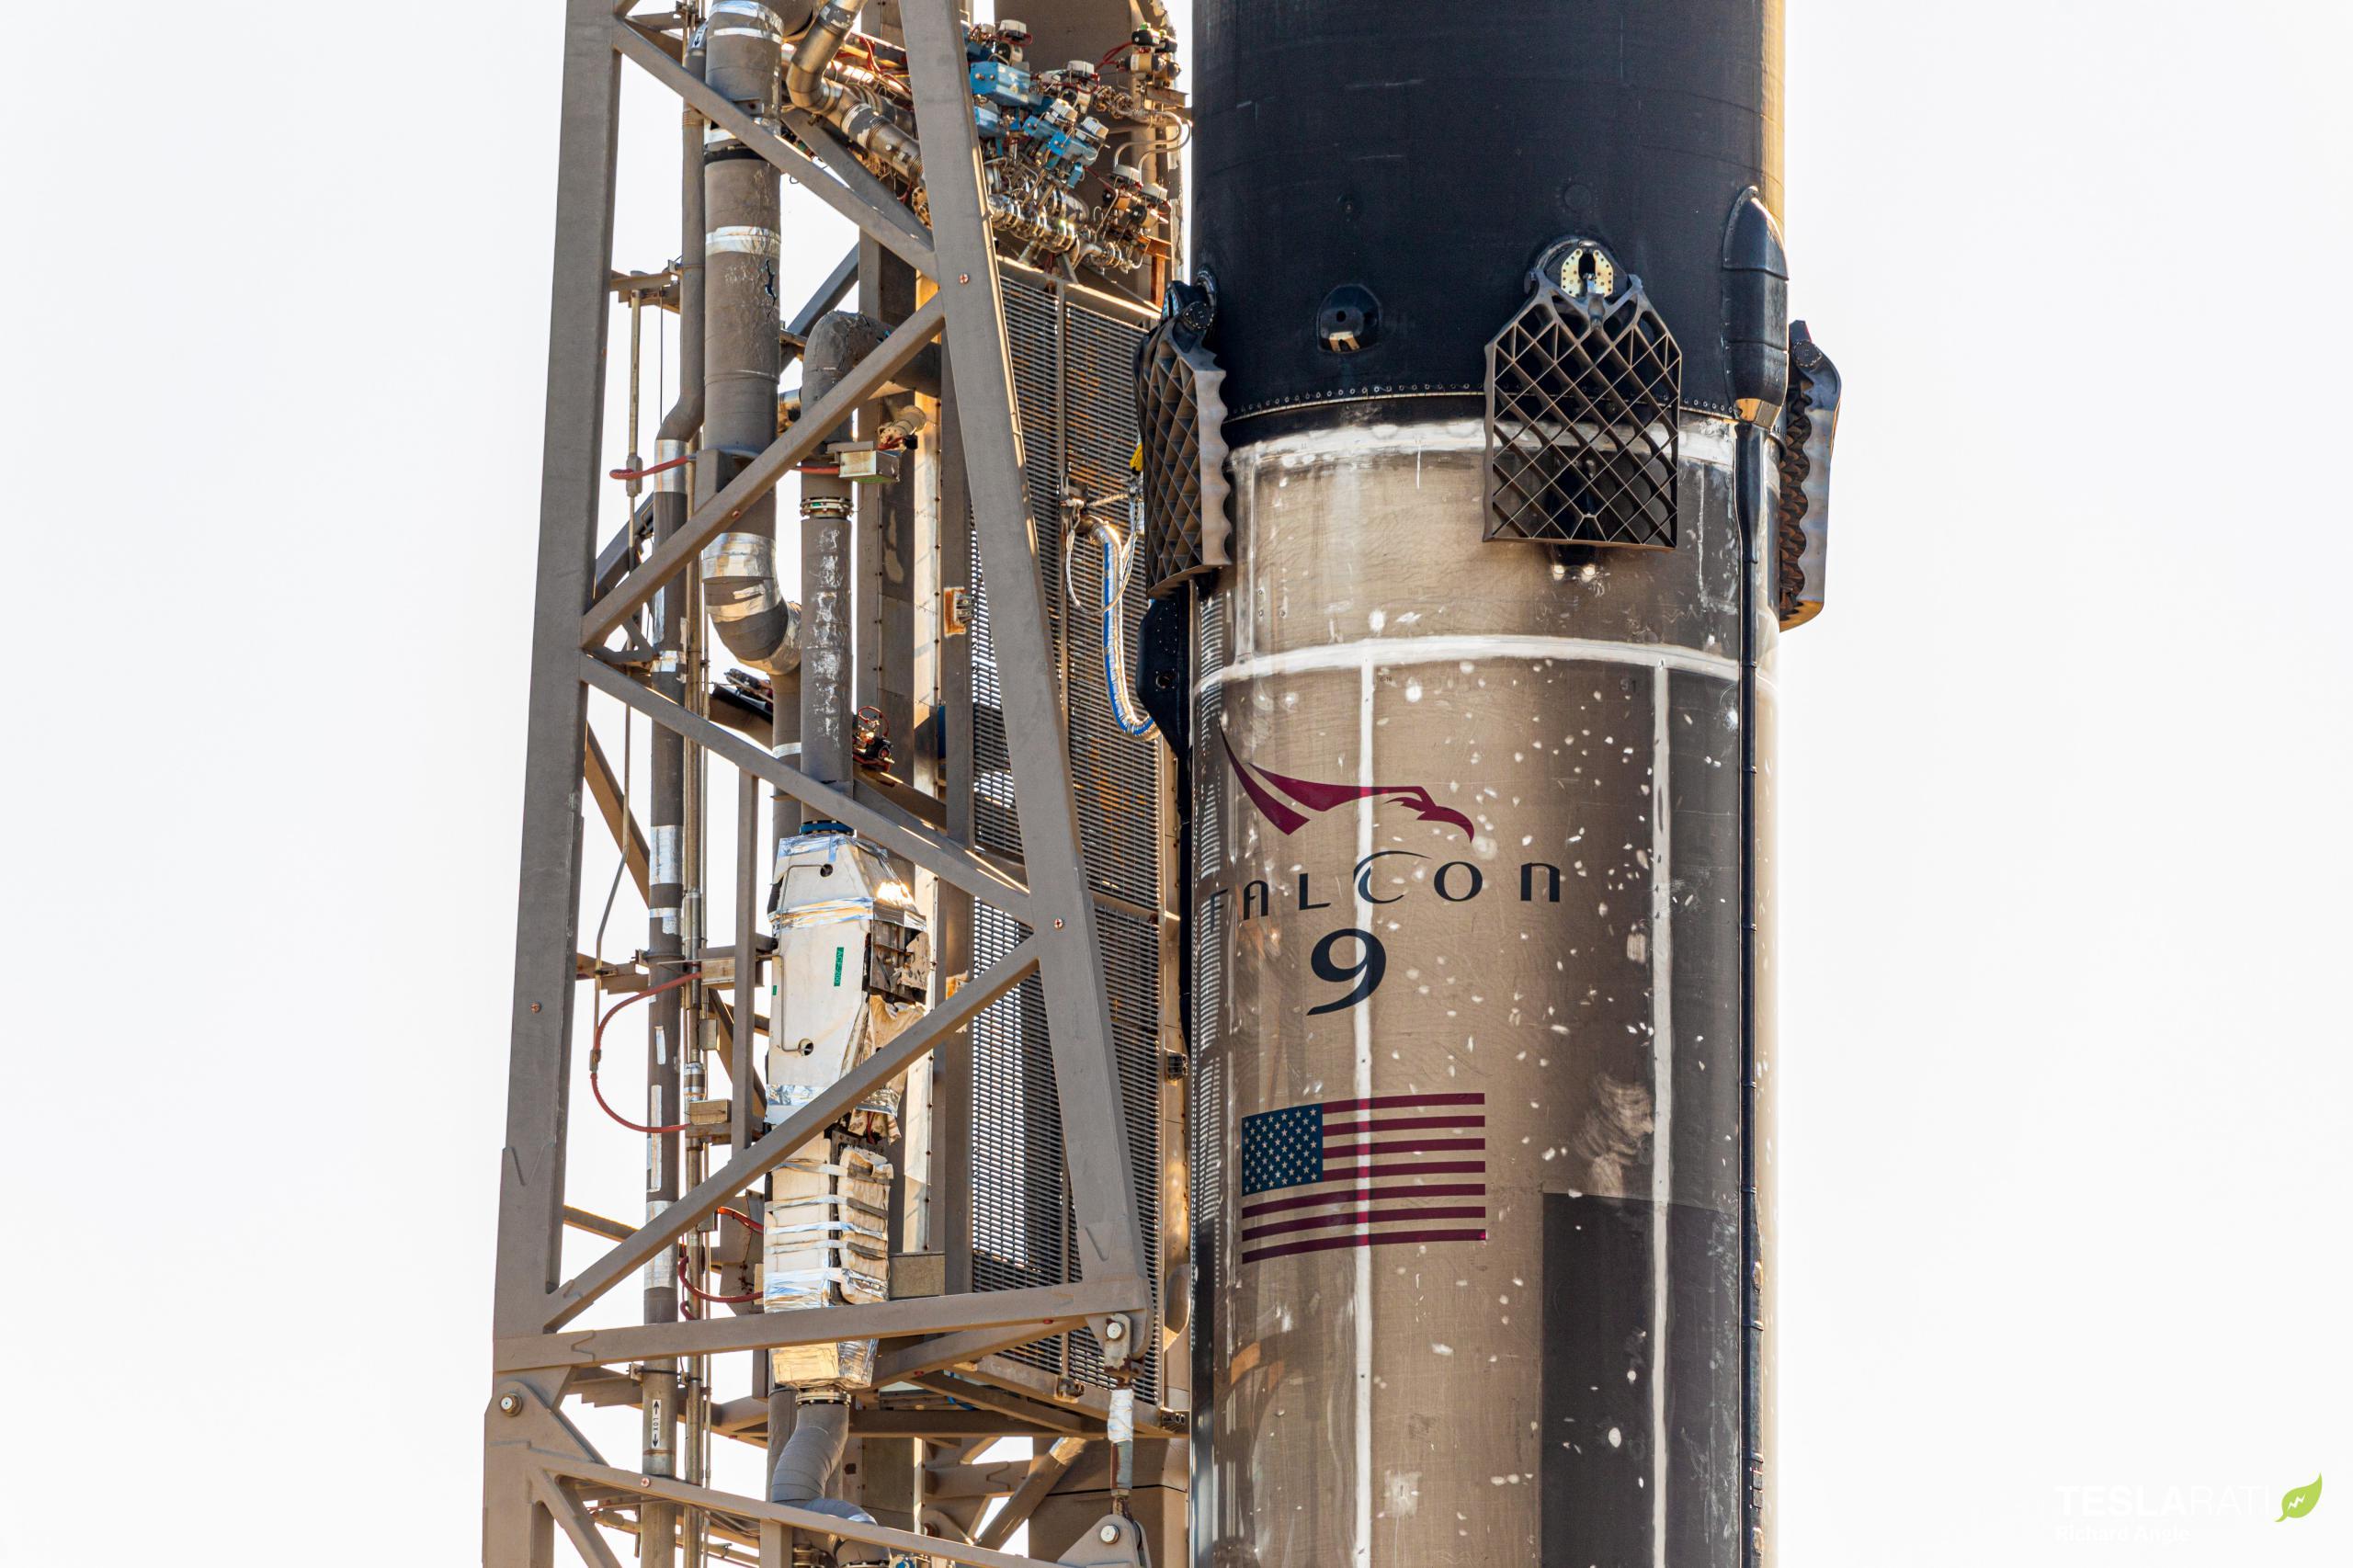 Starlink-27 Falcon 9 B1051 050921 (Richard Angle) prelaunch 2 (c)